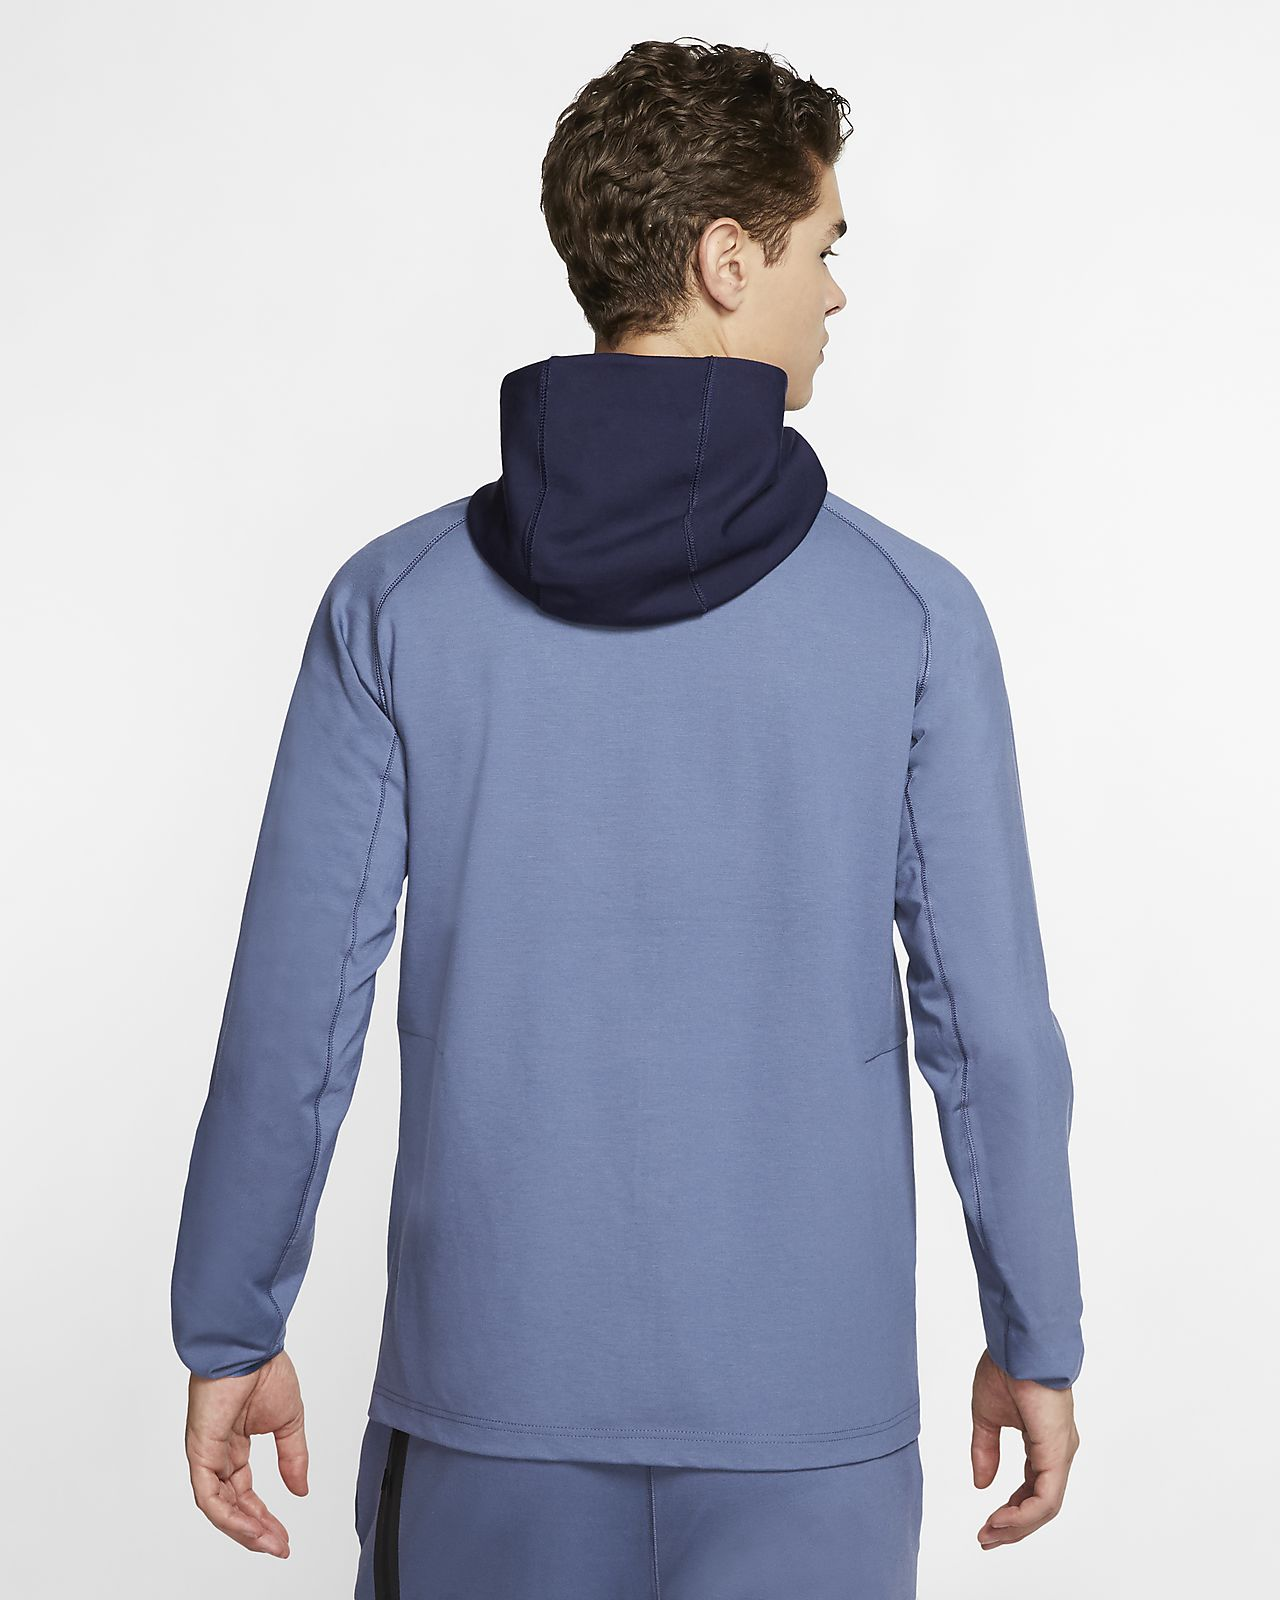 Nike Sportswear Men's Full Zip Hoodie